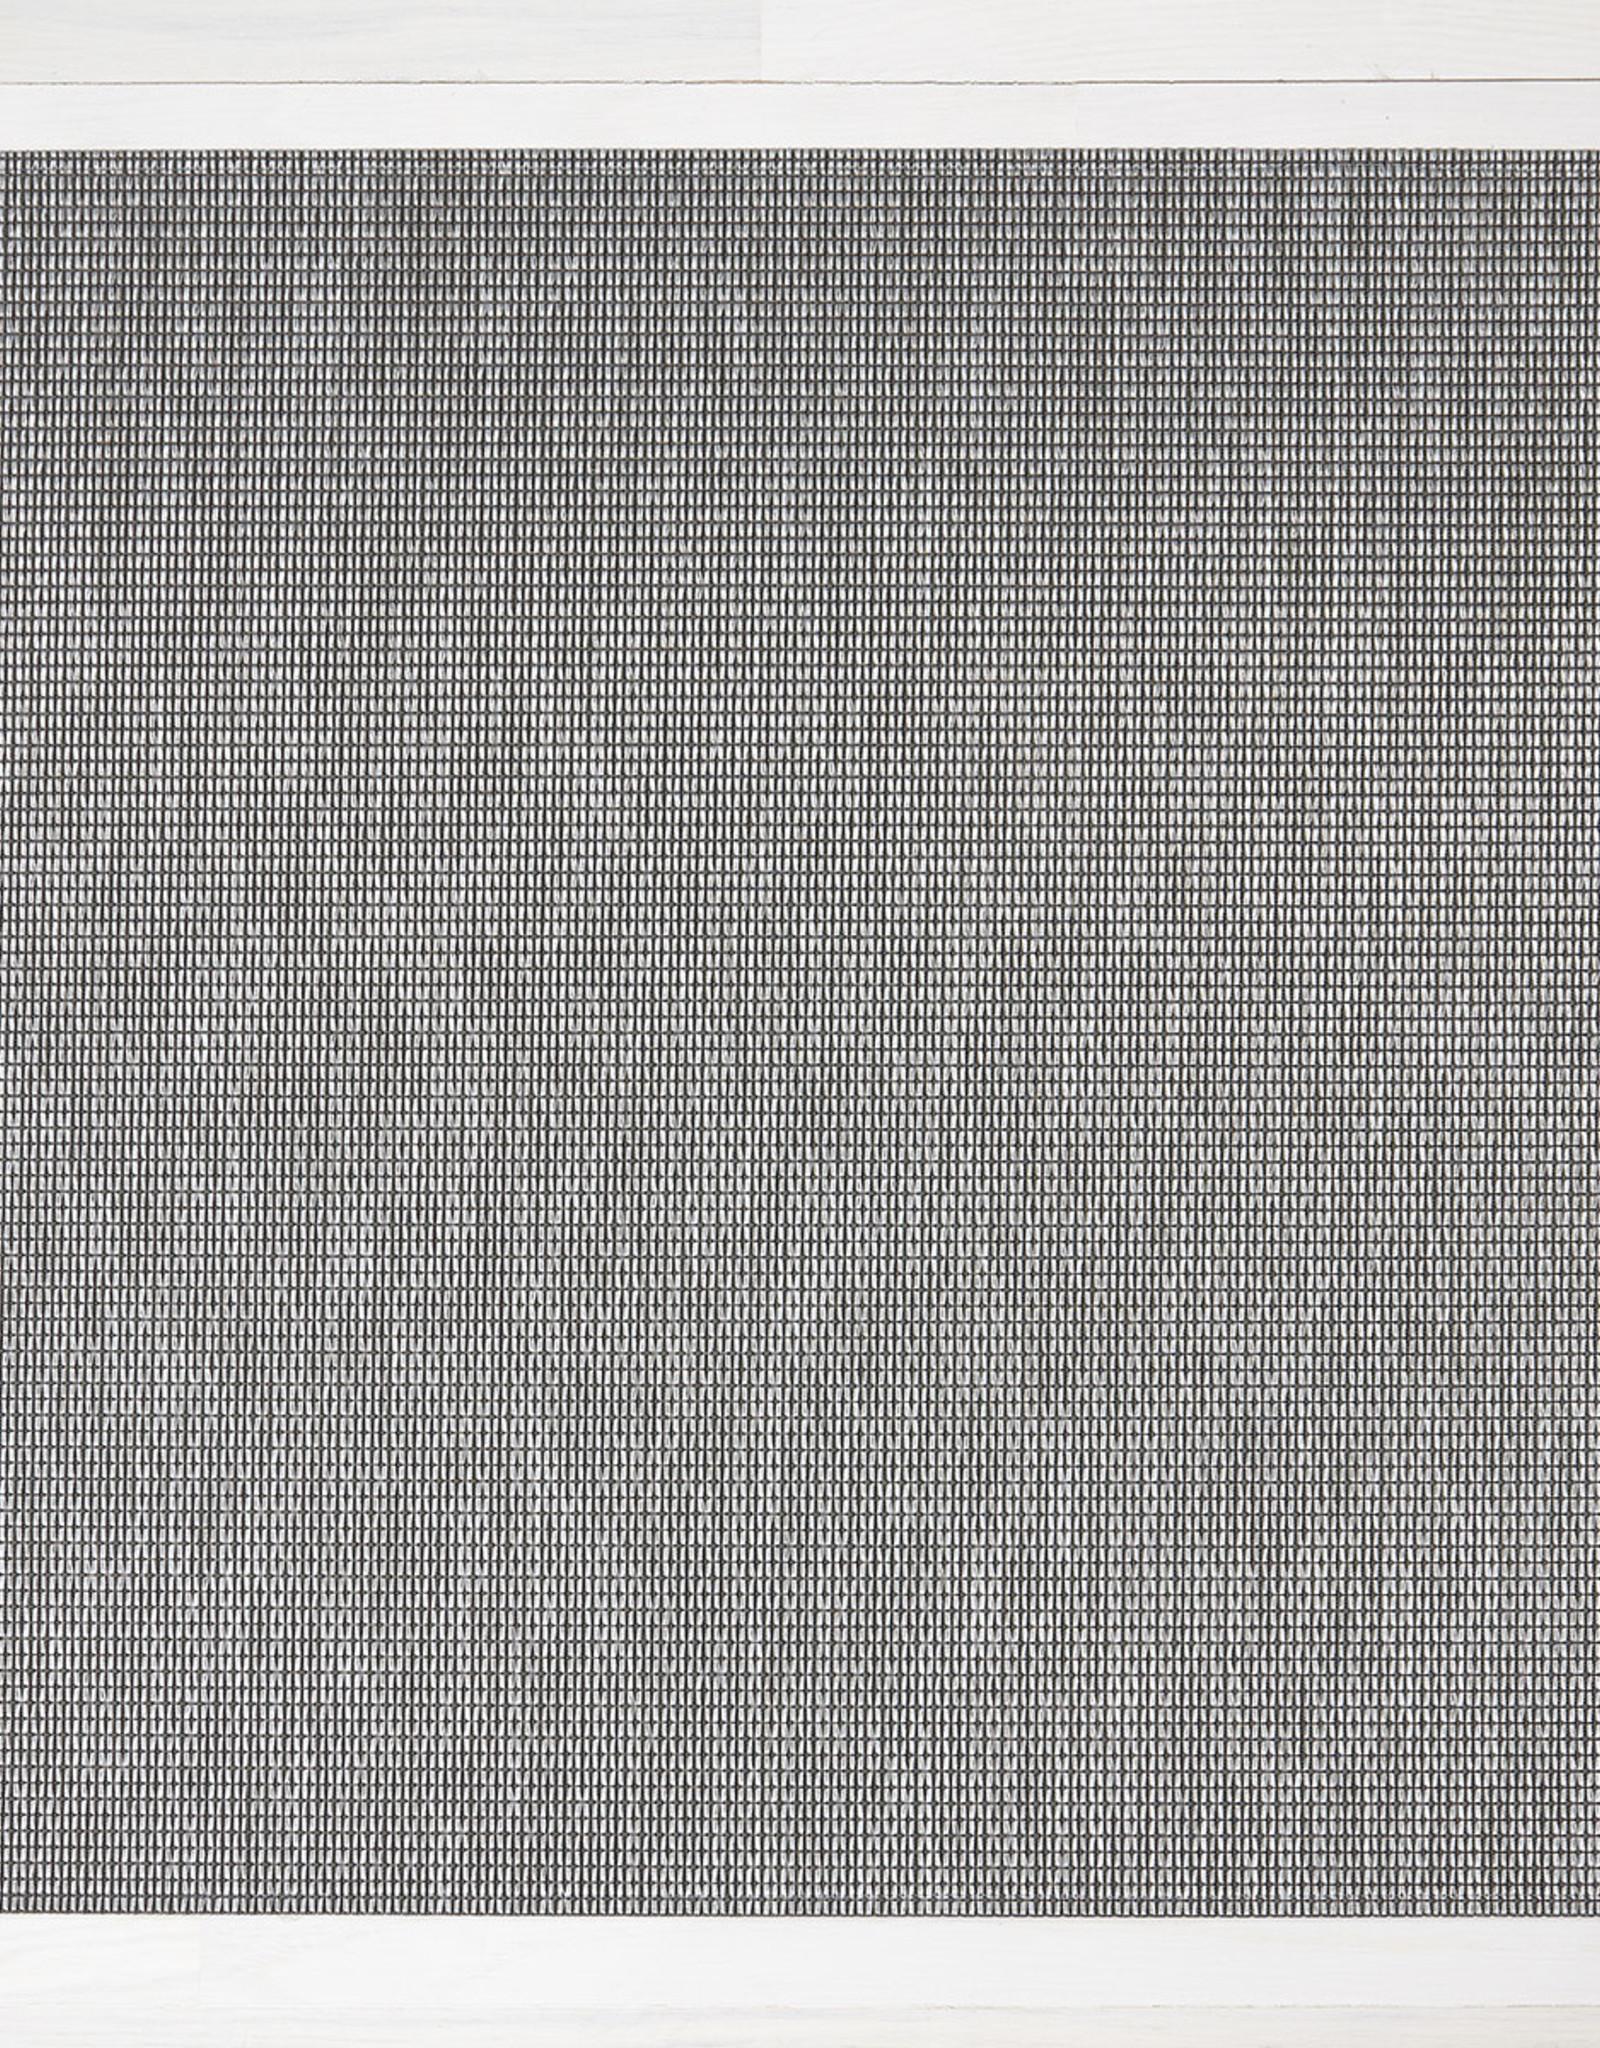 Chilewich Wabi Sabi Floormat 23 x 36, MICA